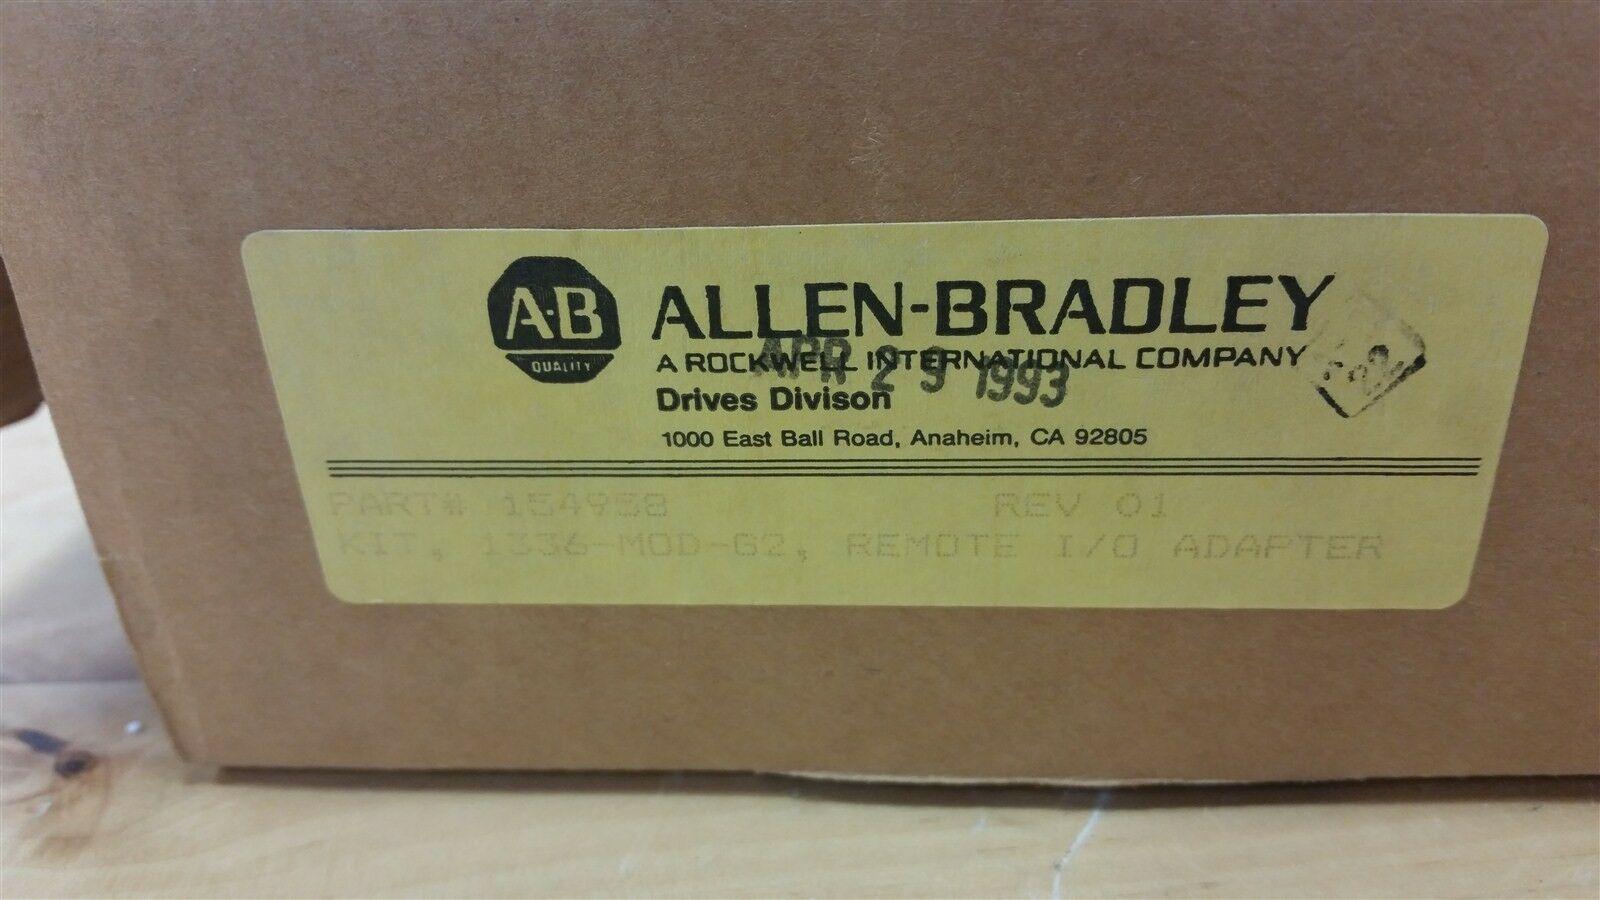 Lot 14A - NEW ALLEN BRADLEY AC DRIVE 1336-MOD-G2 REV. 01 REMOTE I/O ADAPTER KIT